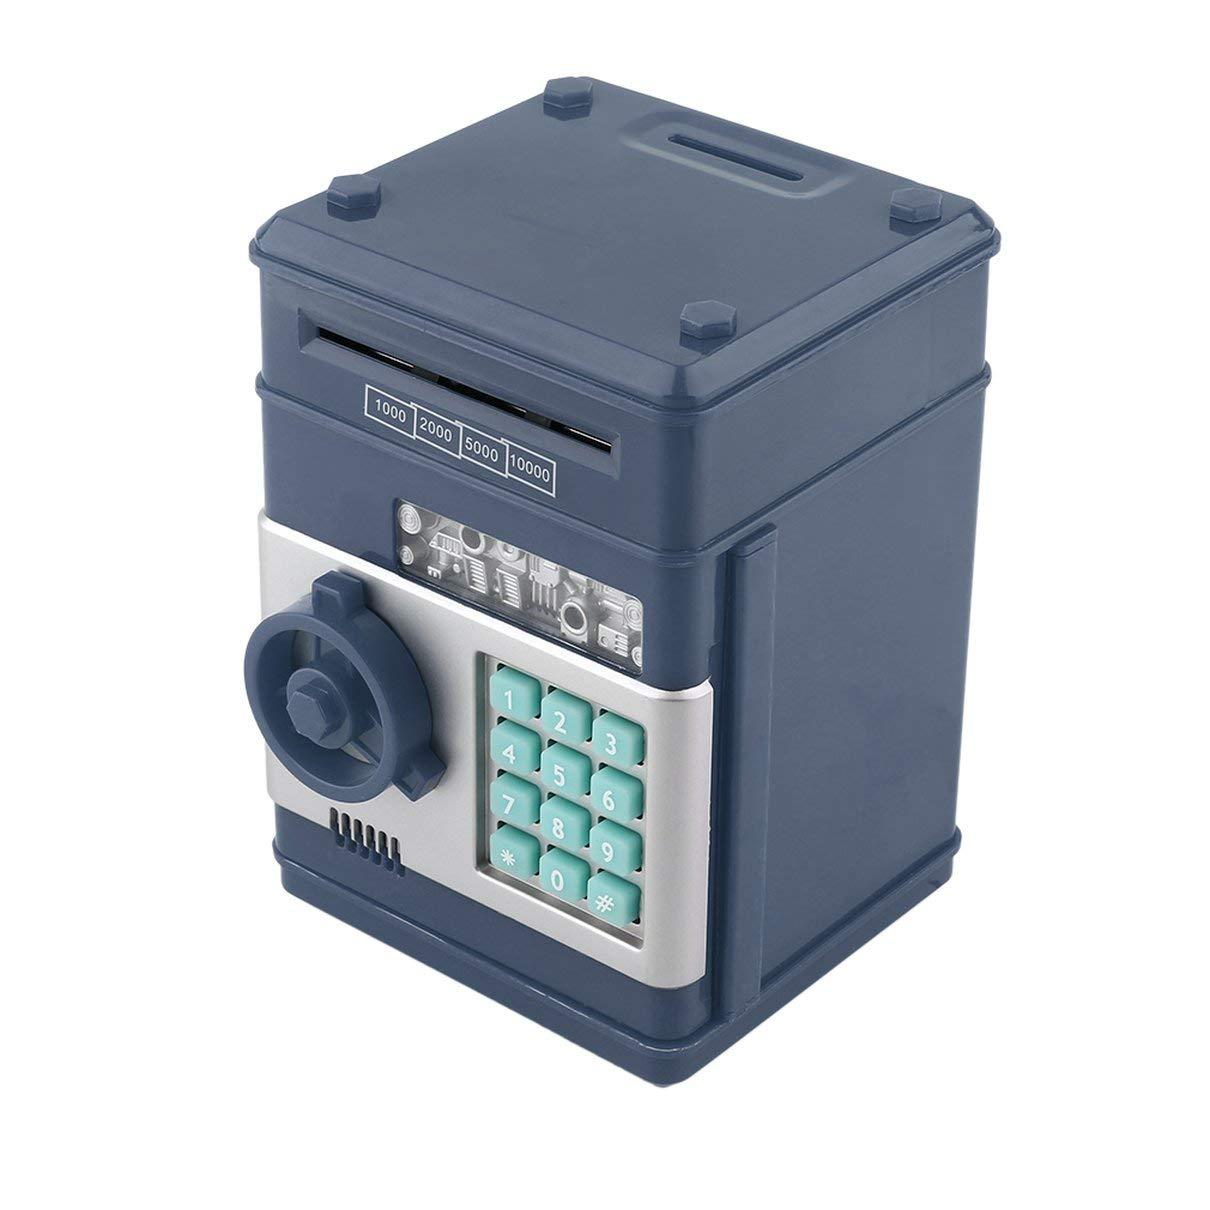 Togames 7Colors Kids Electronic Money Safe Box Salvadanaio Bancomat Bancomat per Monete e Banconote Codice Caso Chiave Sistema Cassa Risparmio Rosa